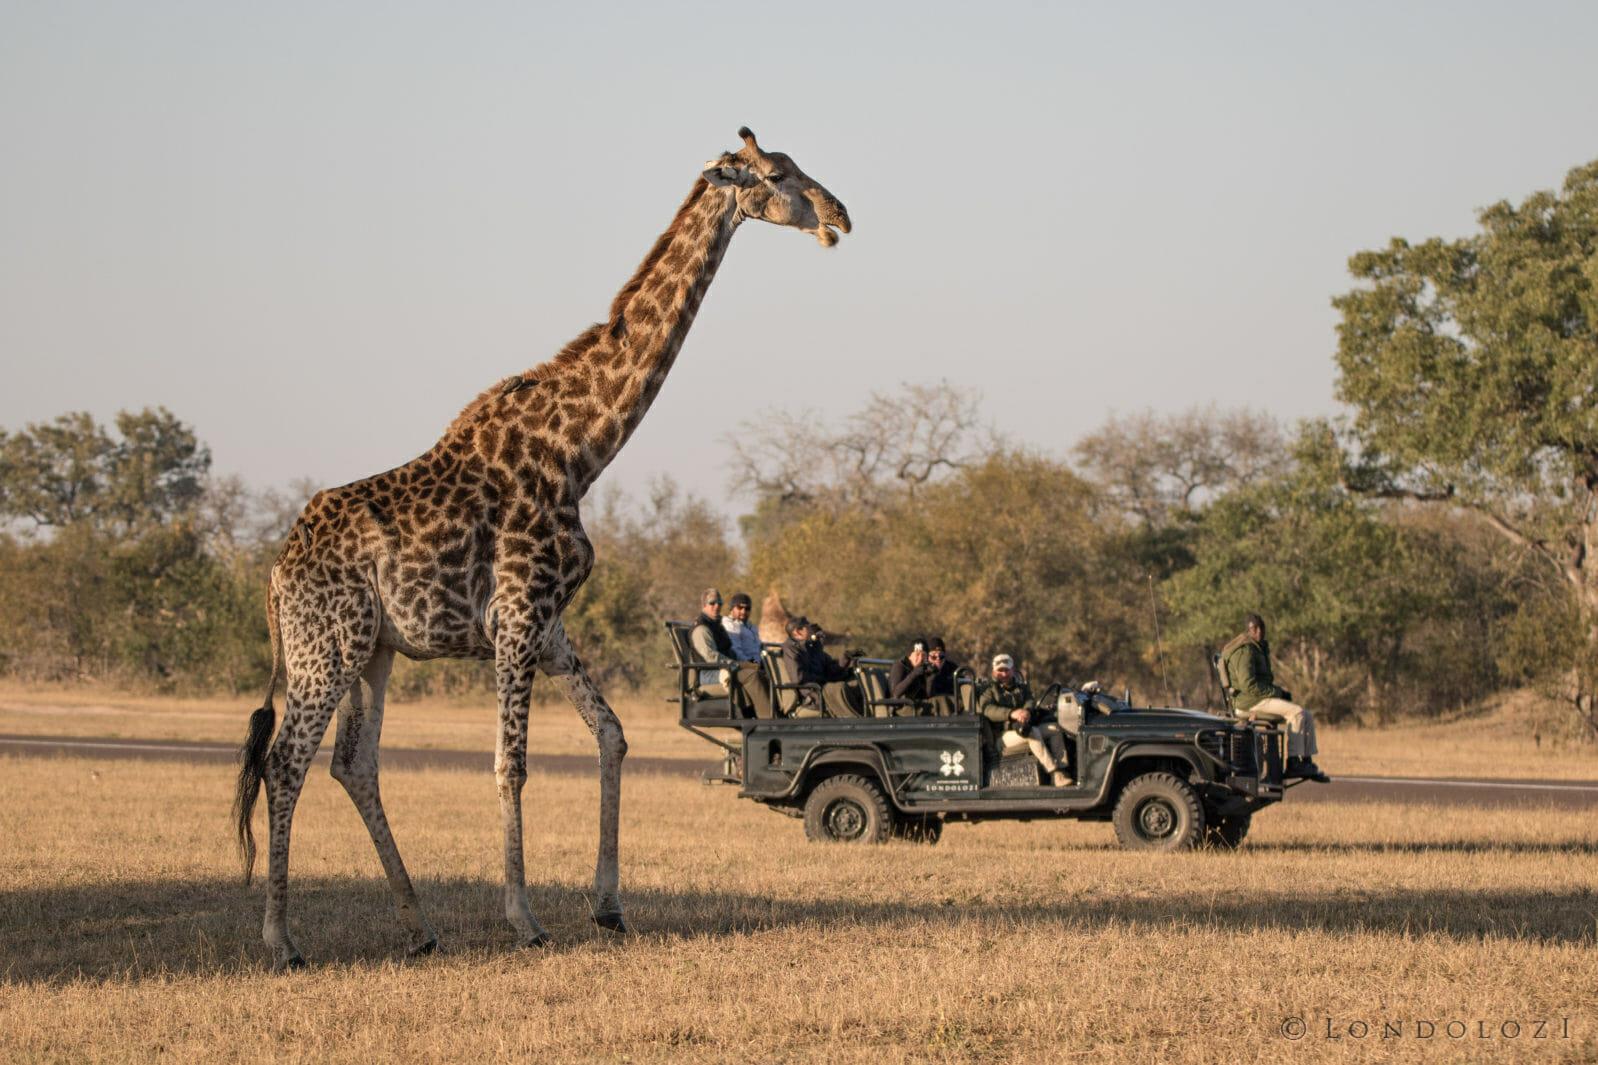 giraffe, airstrip, guests, alex jordan, lucky shibangu, PT 2018